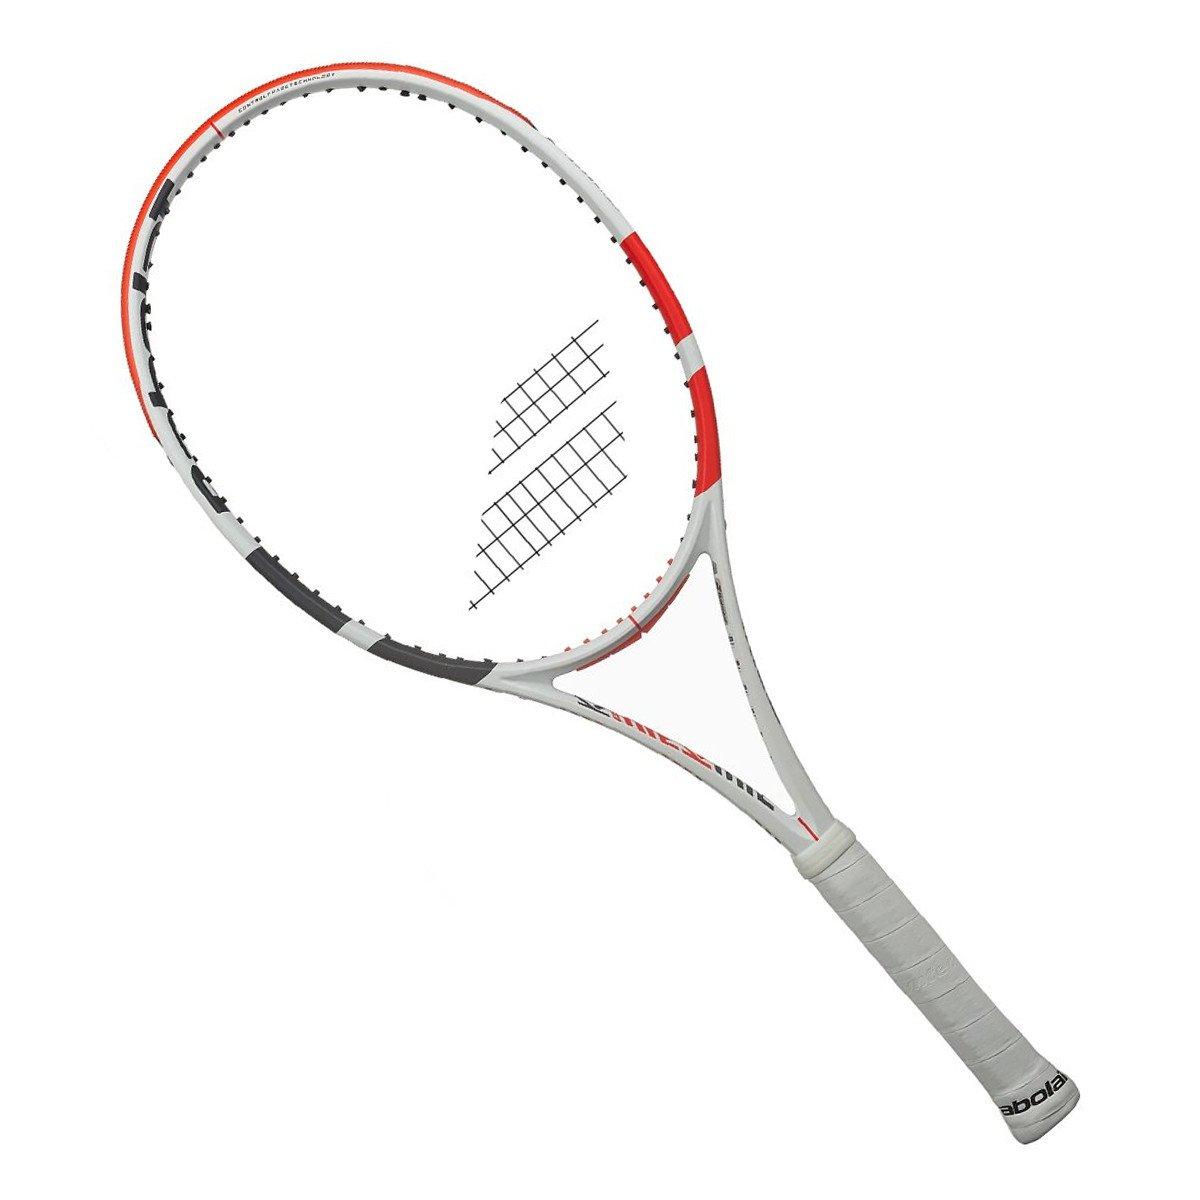 Raquete de Tênis Babolat Pure Strike 16X19 98 305g L3